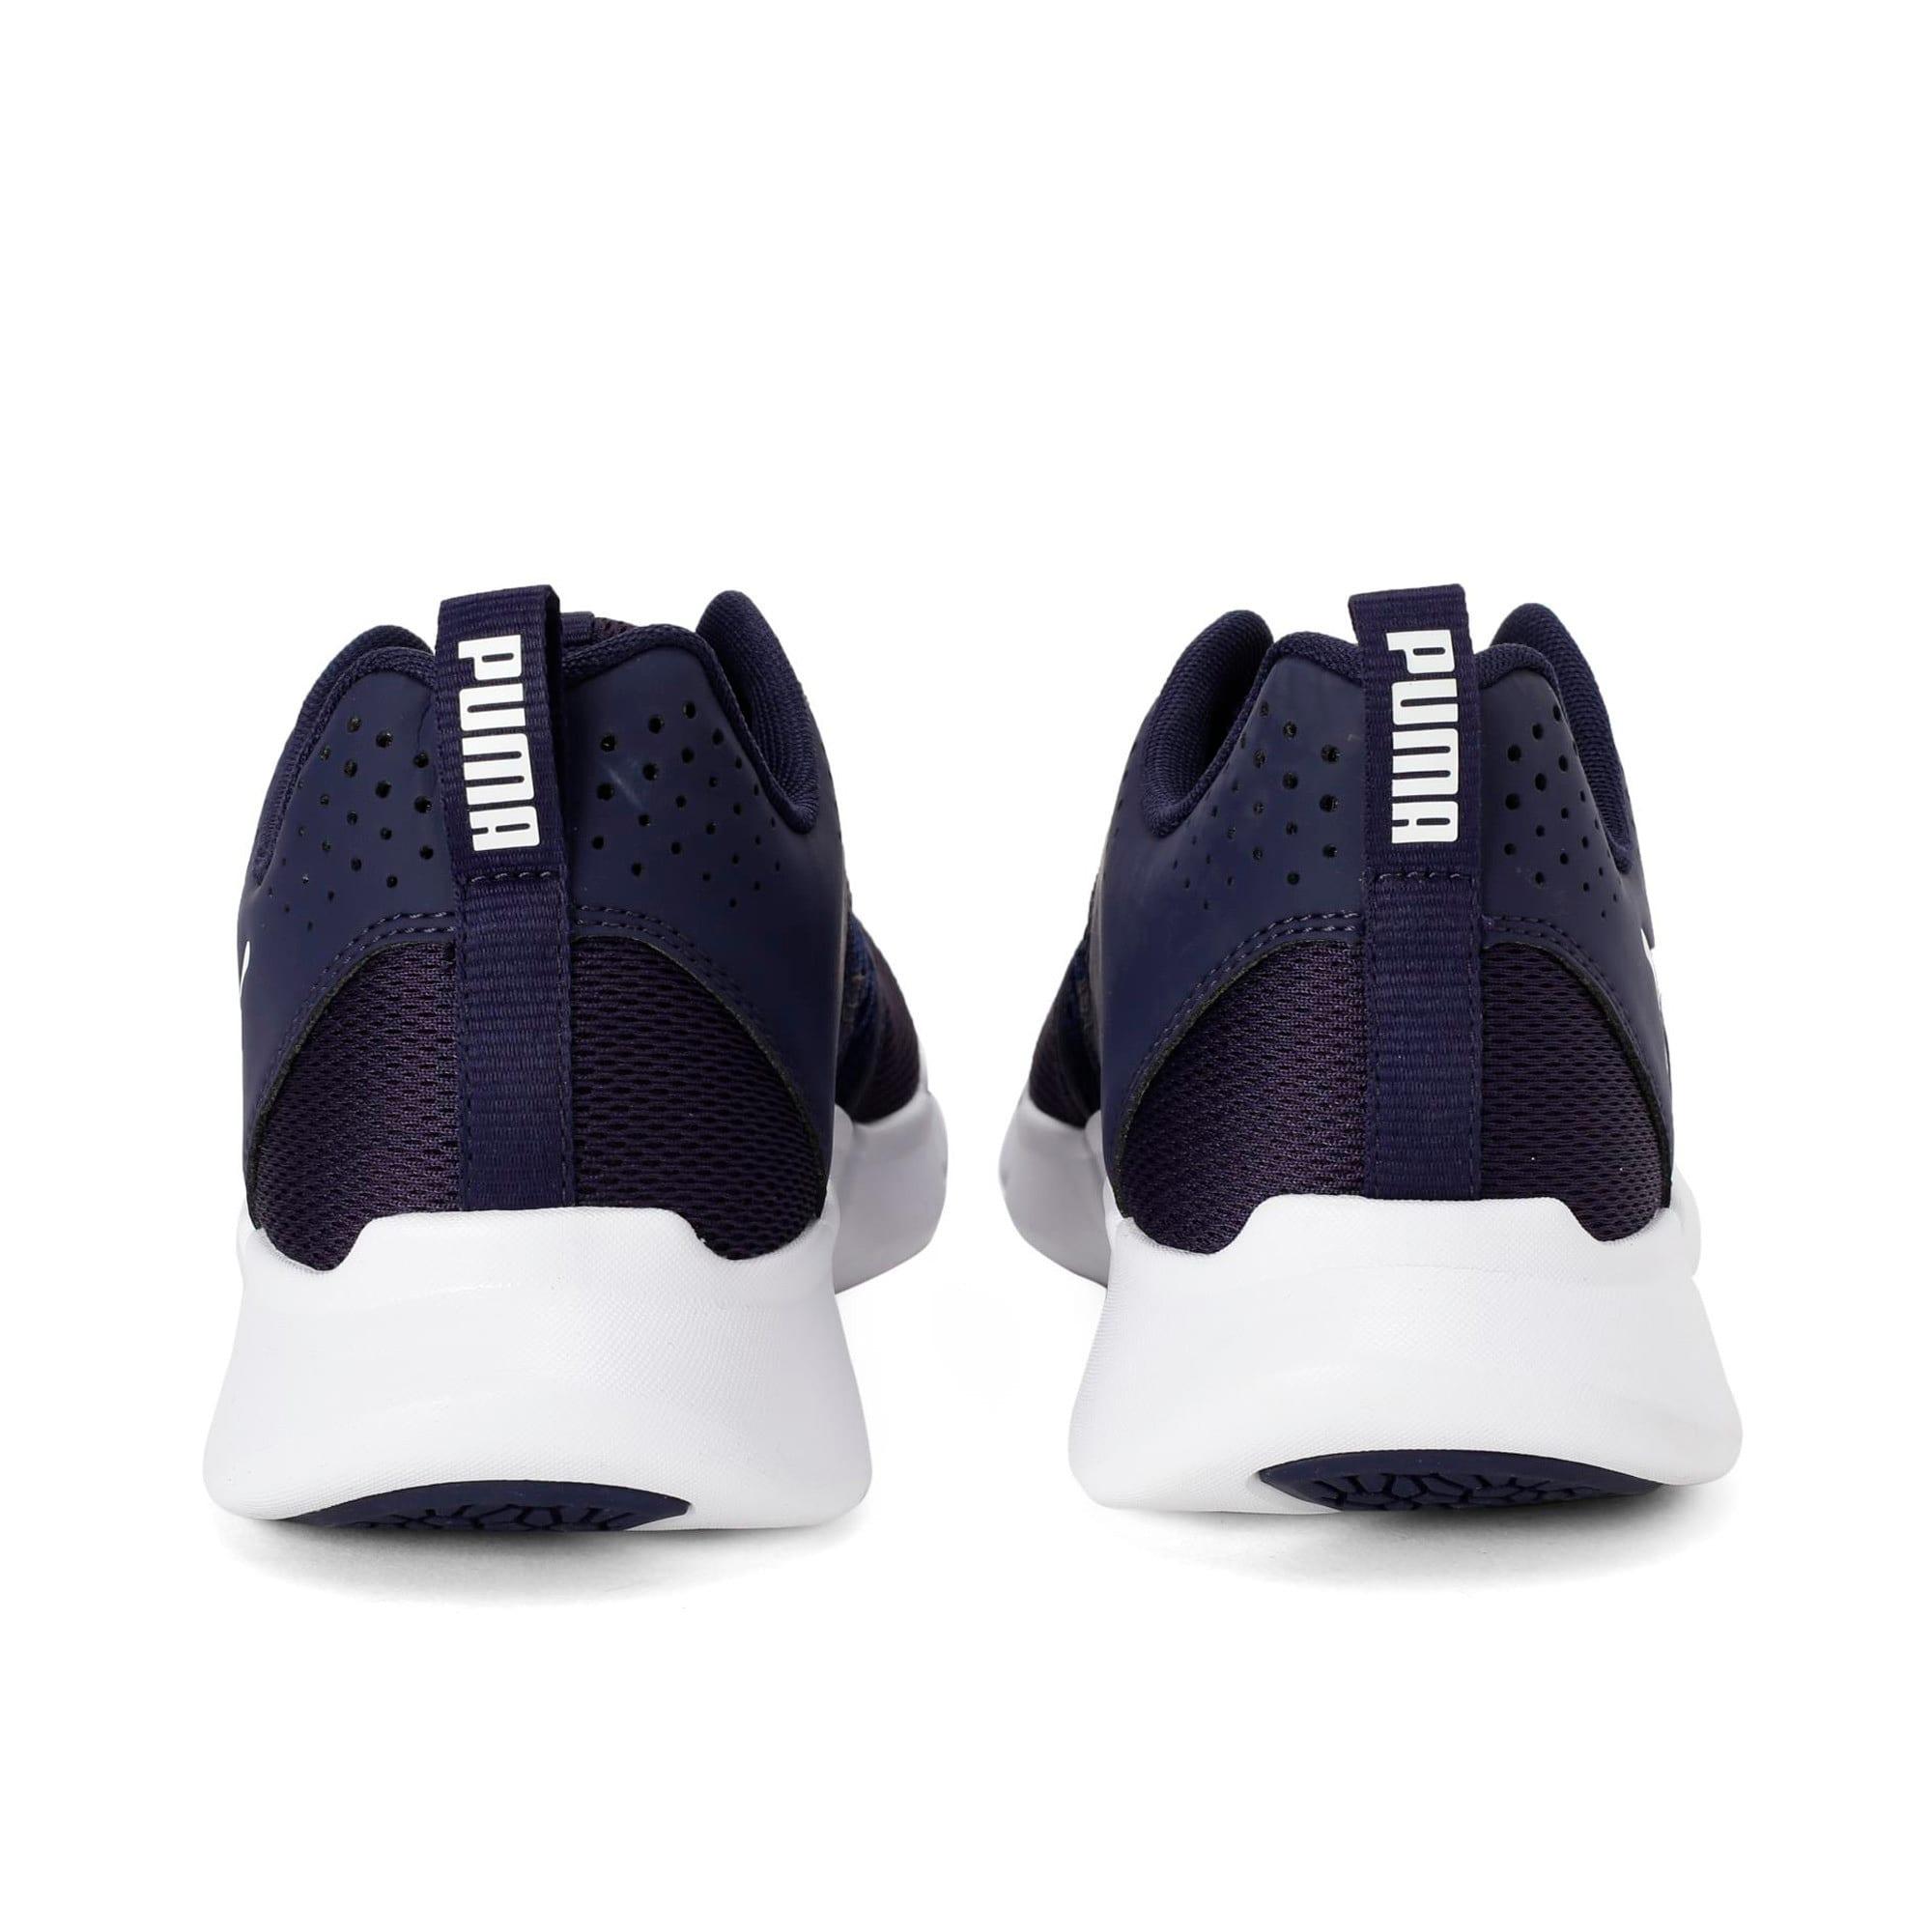 Thumbnail 4 of INTERFLEX Modern Running Shoes, Peacoat-Puma White, medium-IND